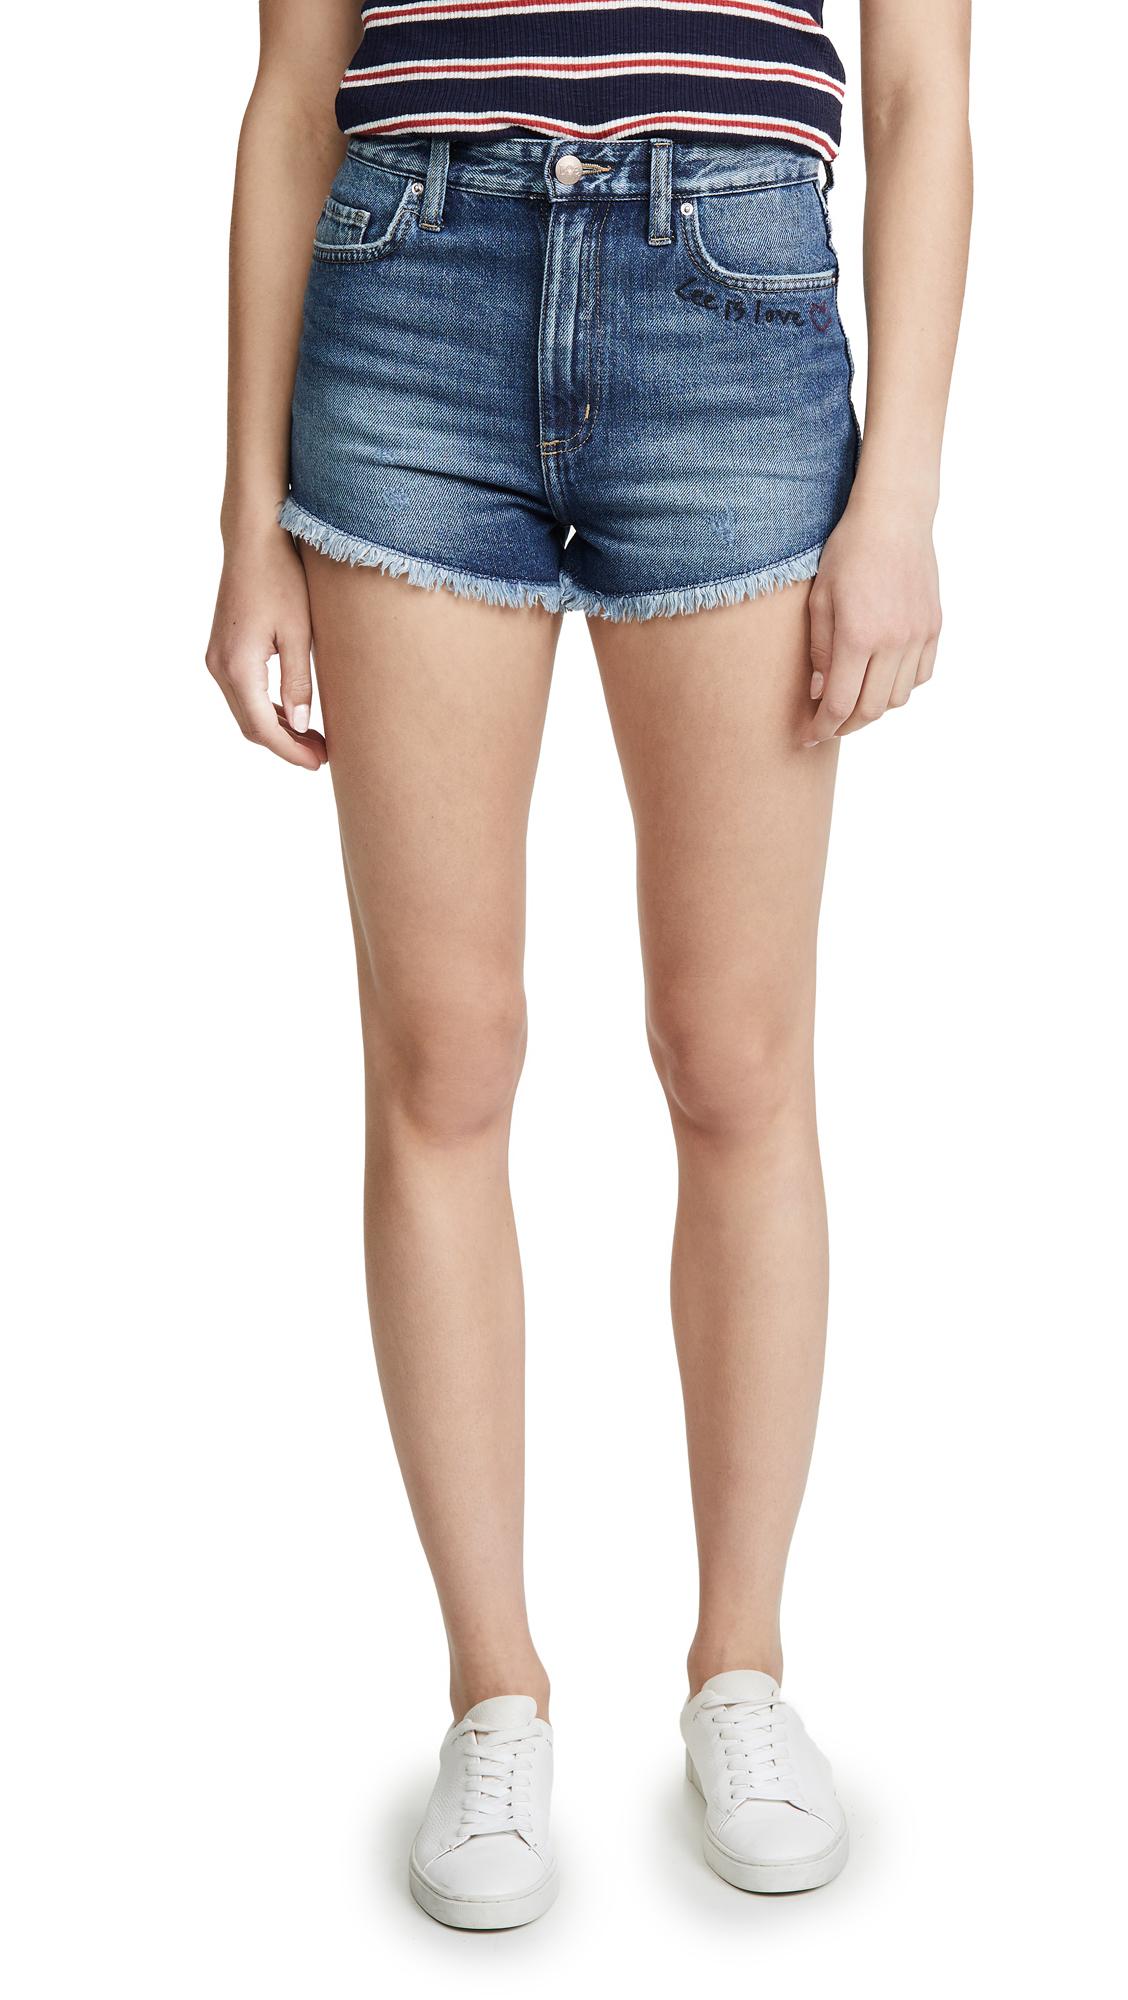 Lee Vintage Modern Cutoff Shorts - True Blue